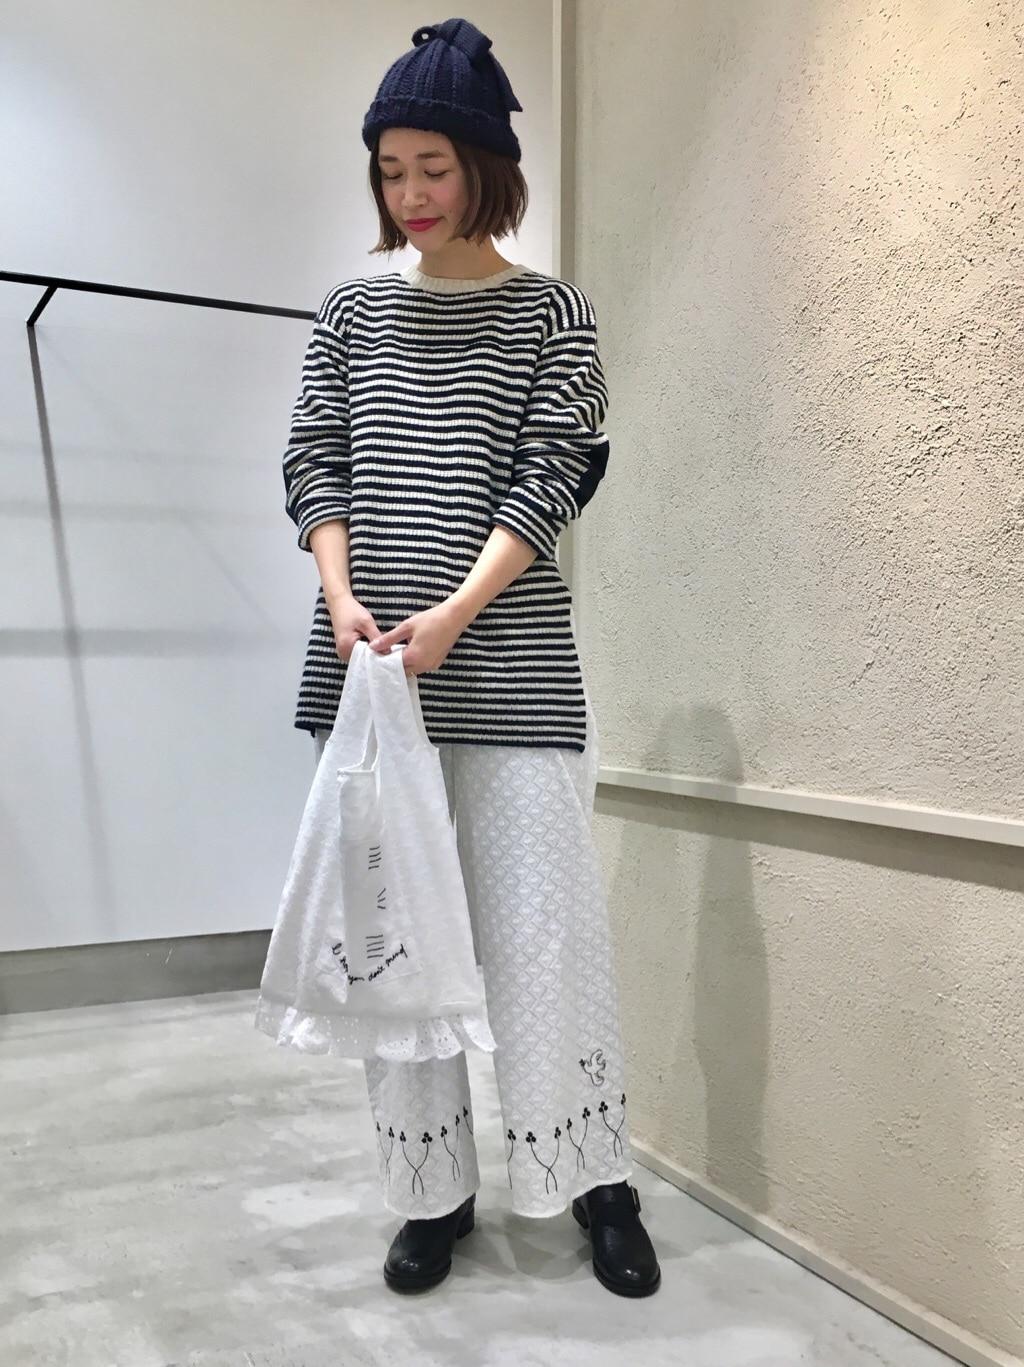 chambre de charme 横浜ジョイナス 身長:160cm 2021.01.09